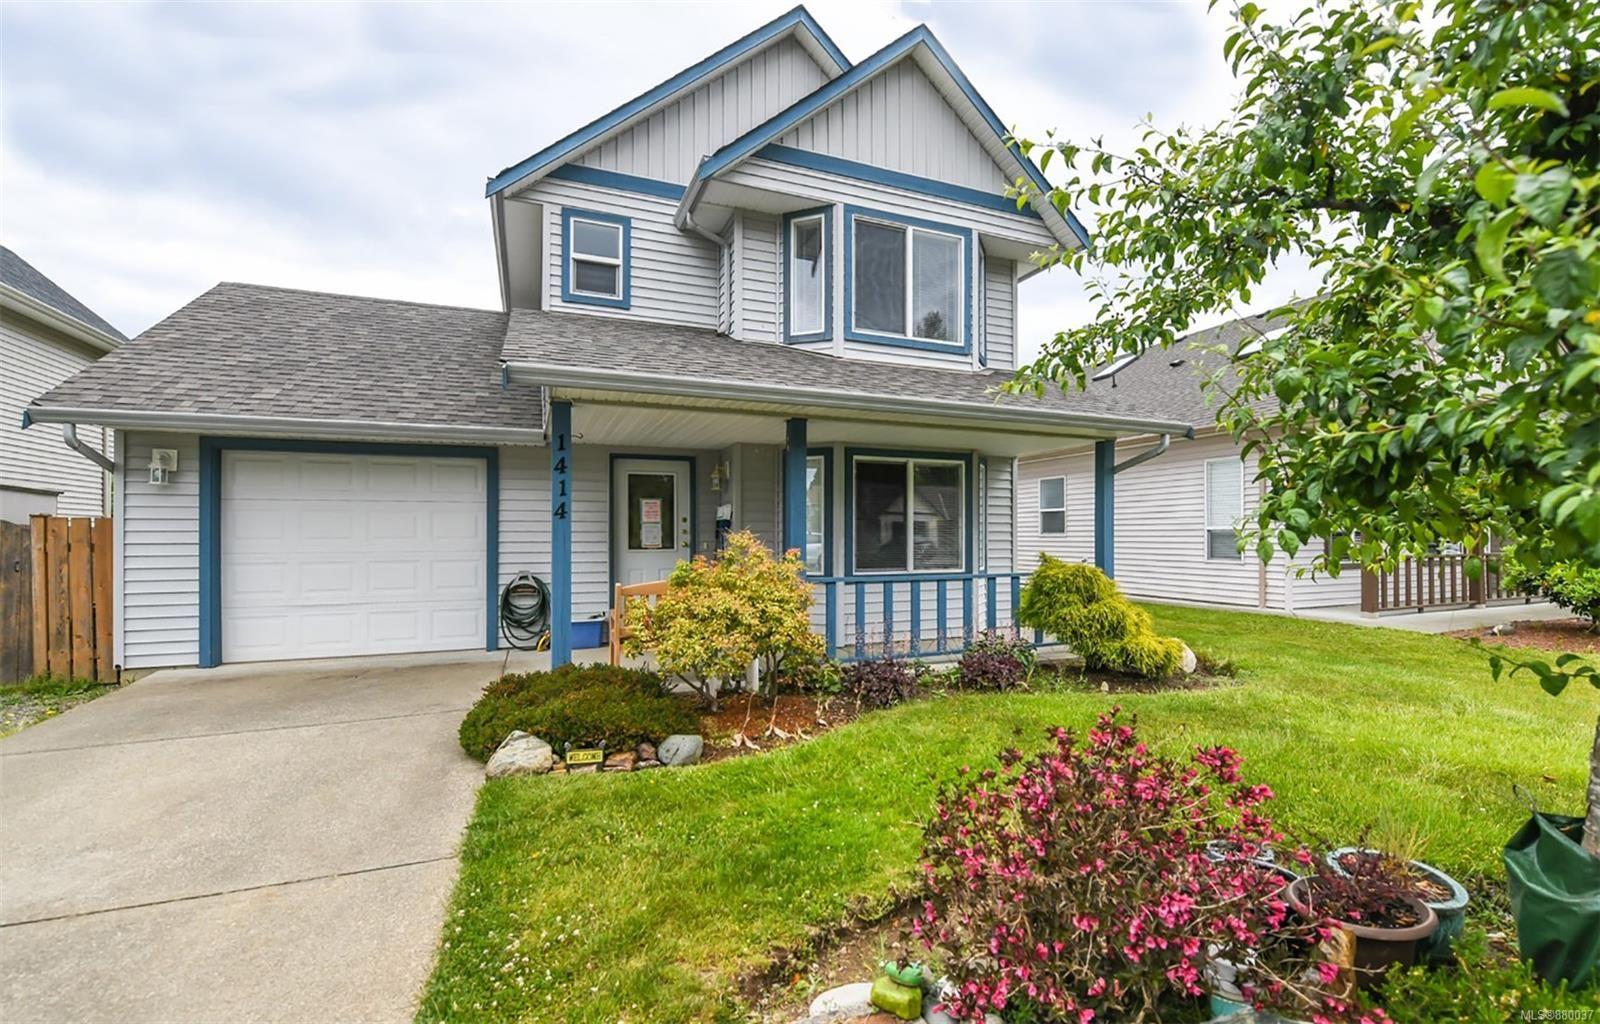 Main Photo: 1414 Krebs Cres in : CV Courtenay City House for sale (Comox Valley)  : MLS®# 880037